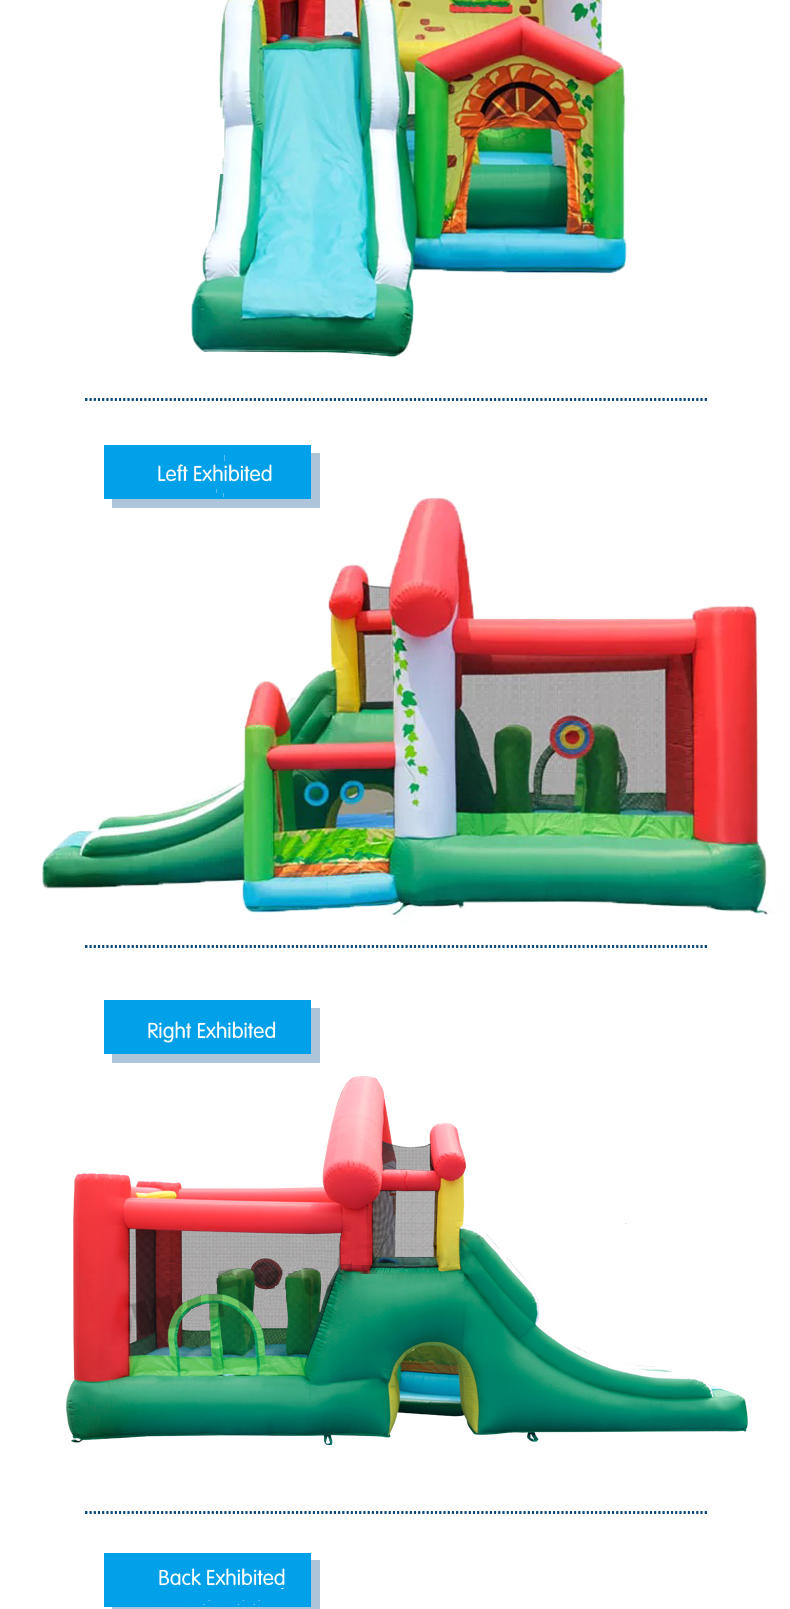 HTB1HePdPFXXXXa3XFXXq6xXFXXXk - Mr. Fun Residential Inflatable Kids Bouncer Trampoline Bounce House with Blower